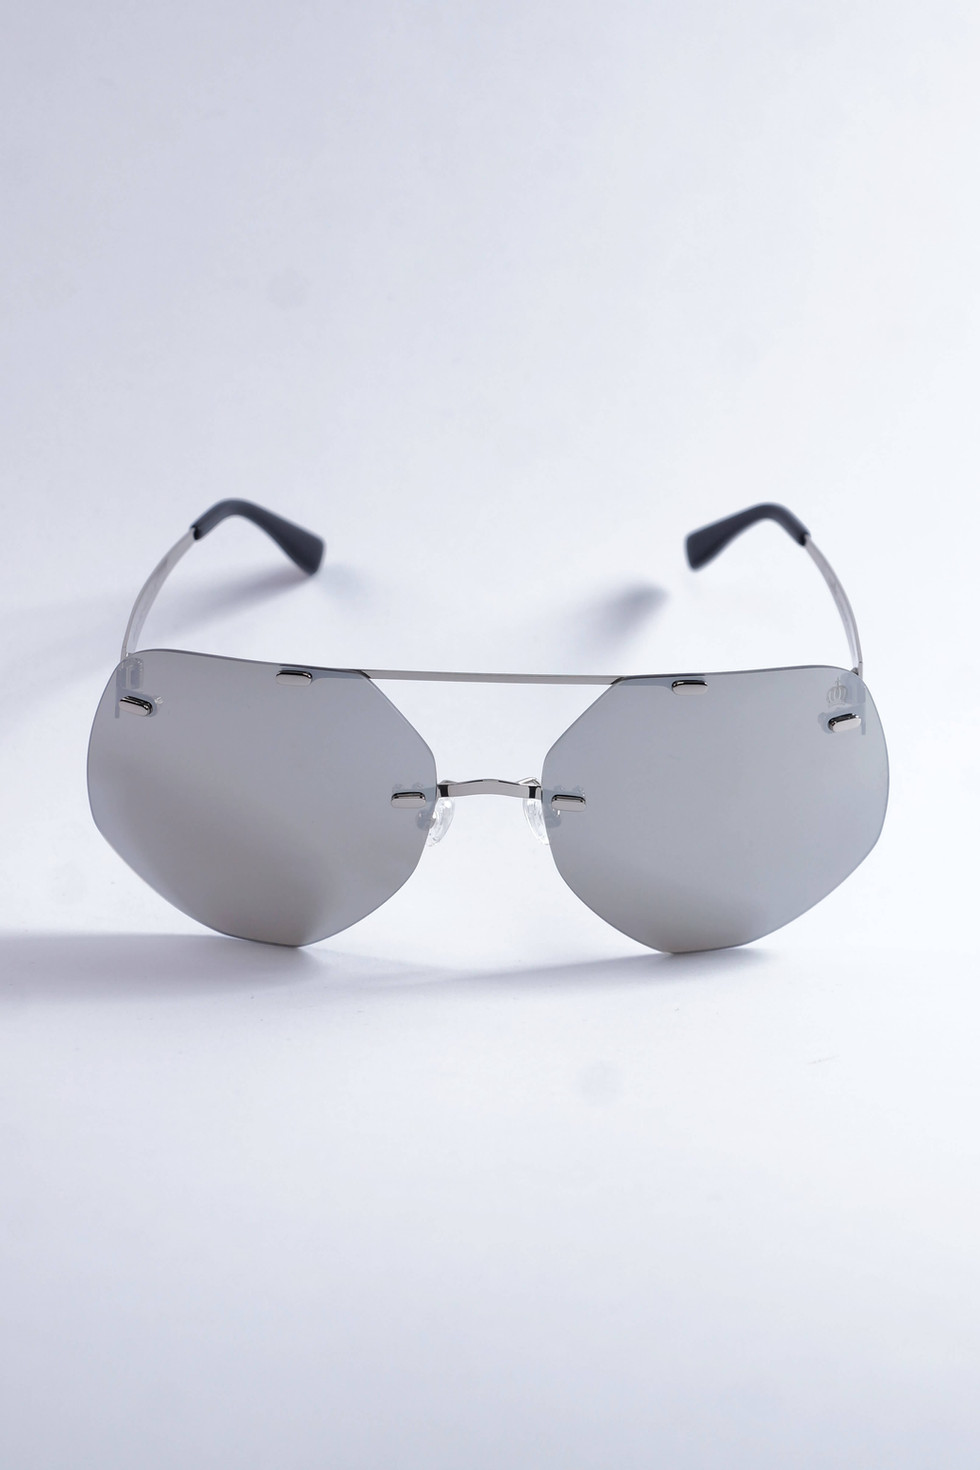 Pompöös Sonnenbrille Berlin, Glasses small 63/19 silber/grau